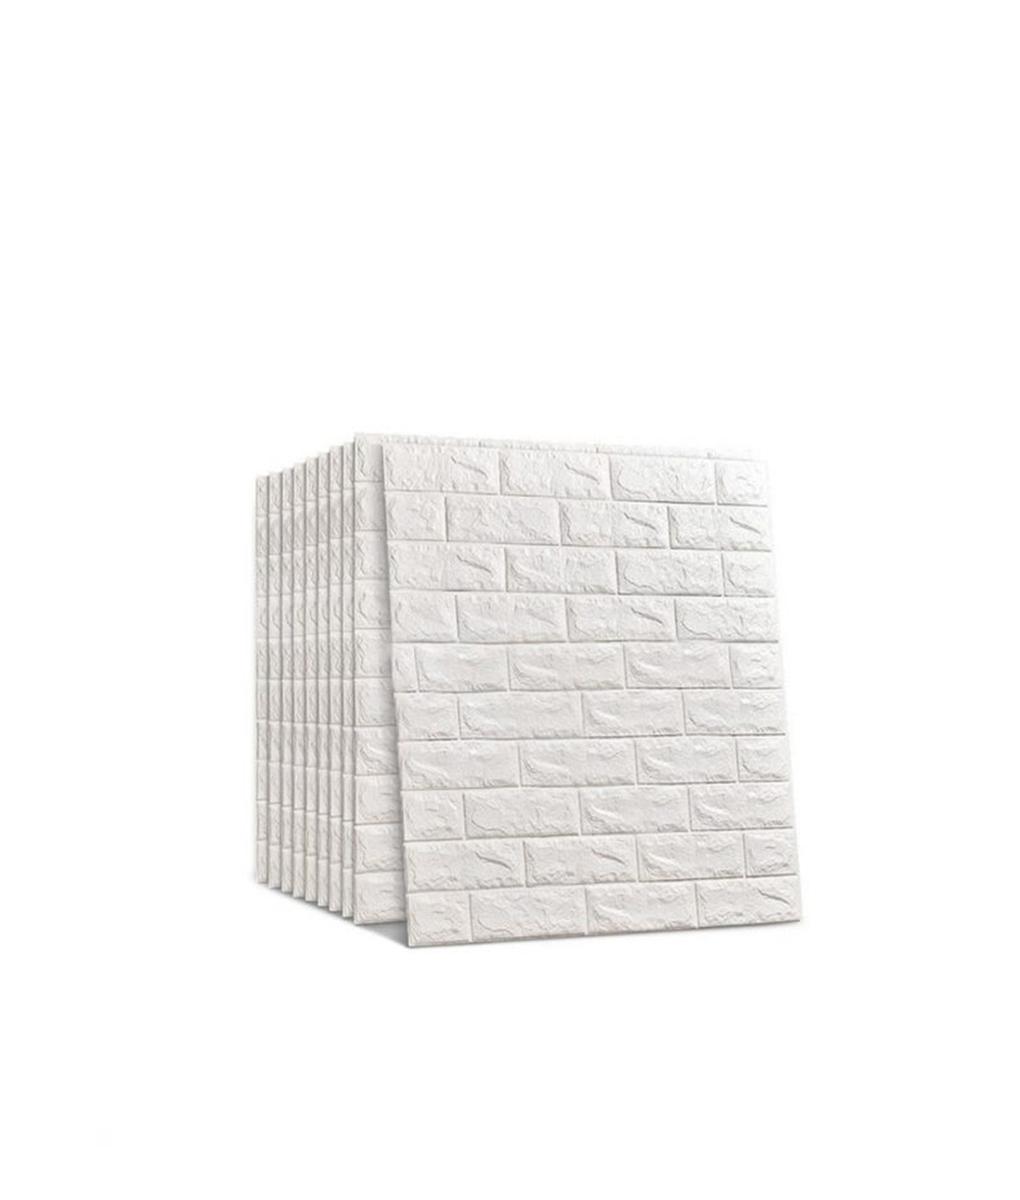 3D Self-Adhesive Faux Foam Bricks Wallpaper